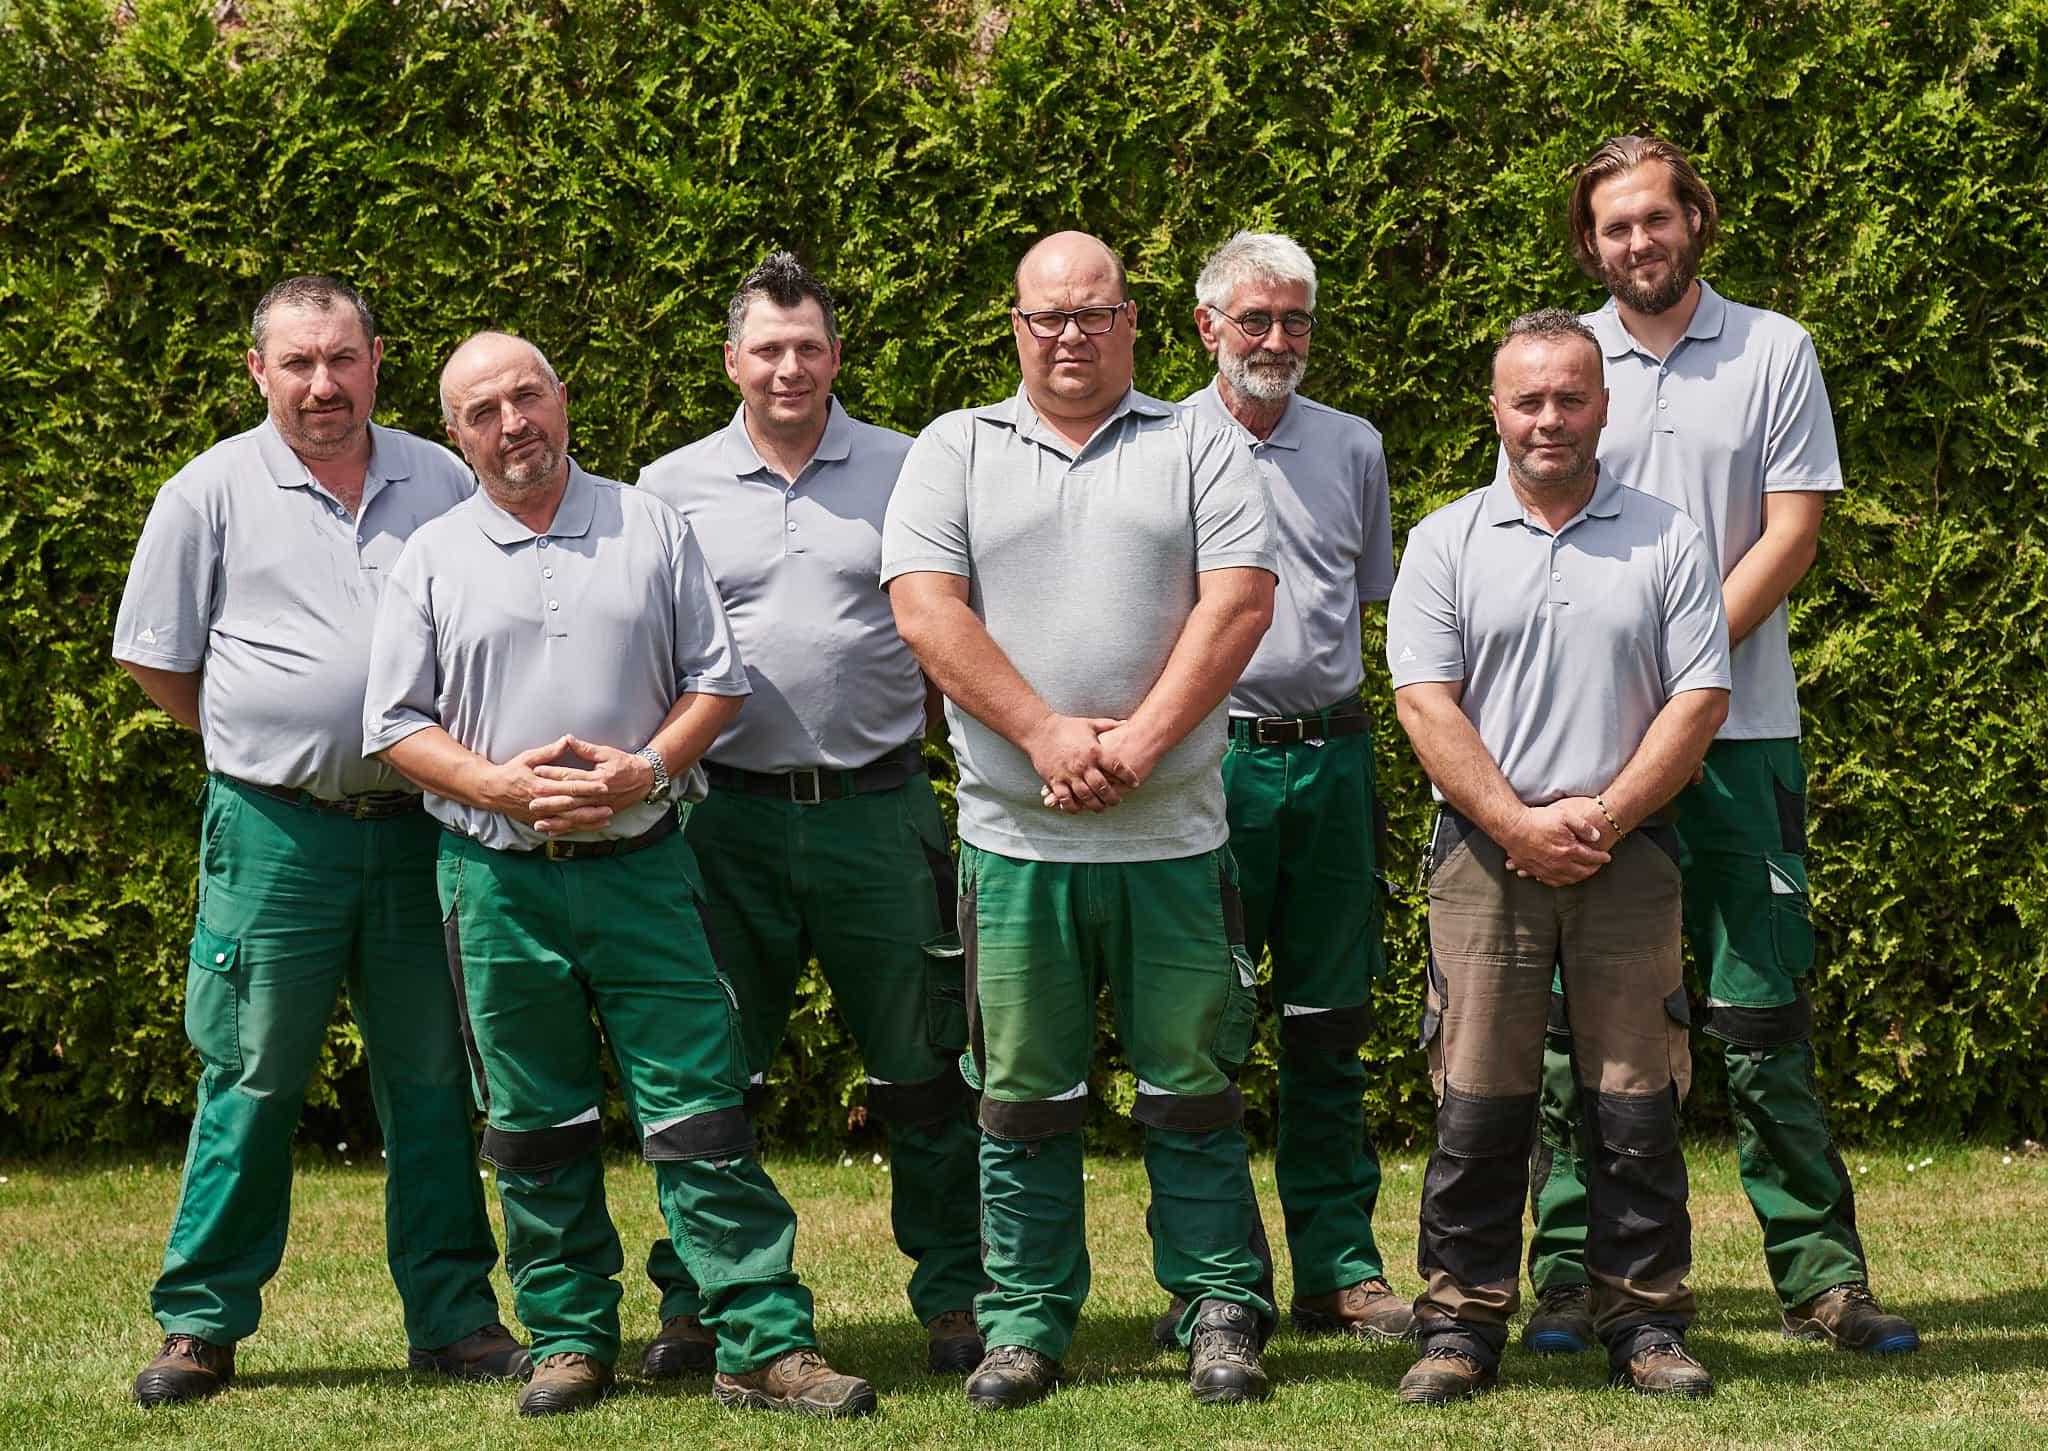 Das Greenkeeping Team des Golfclubs Clostermannshof